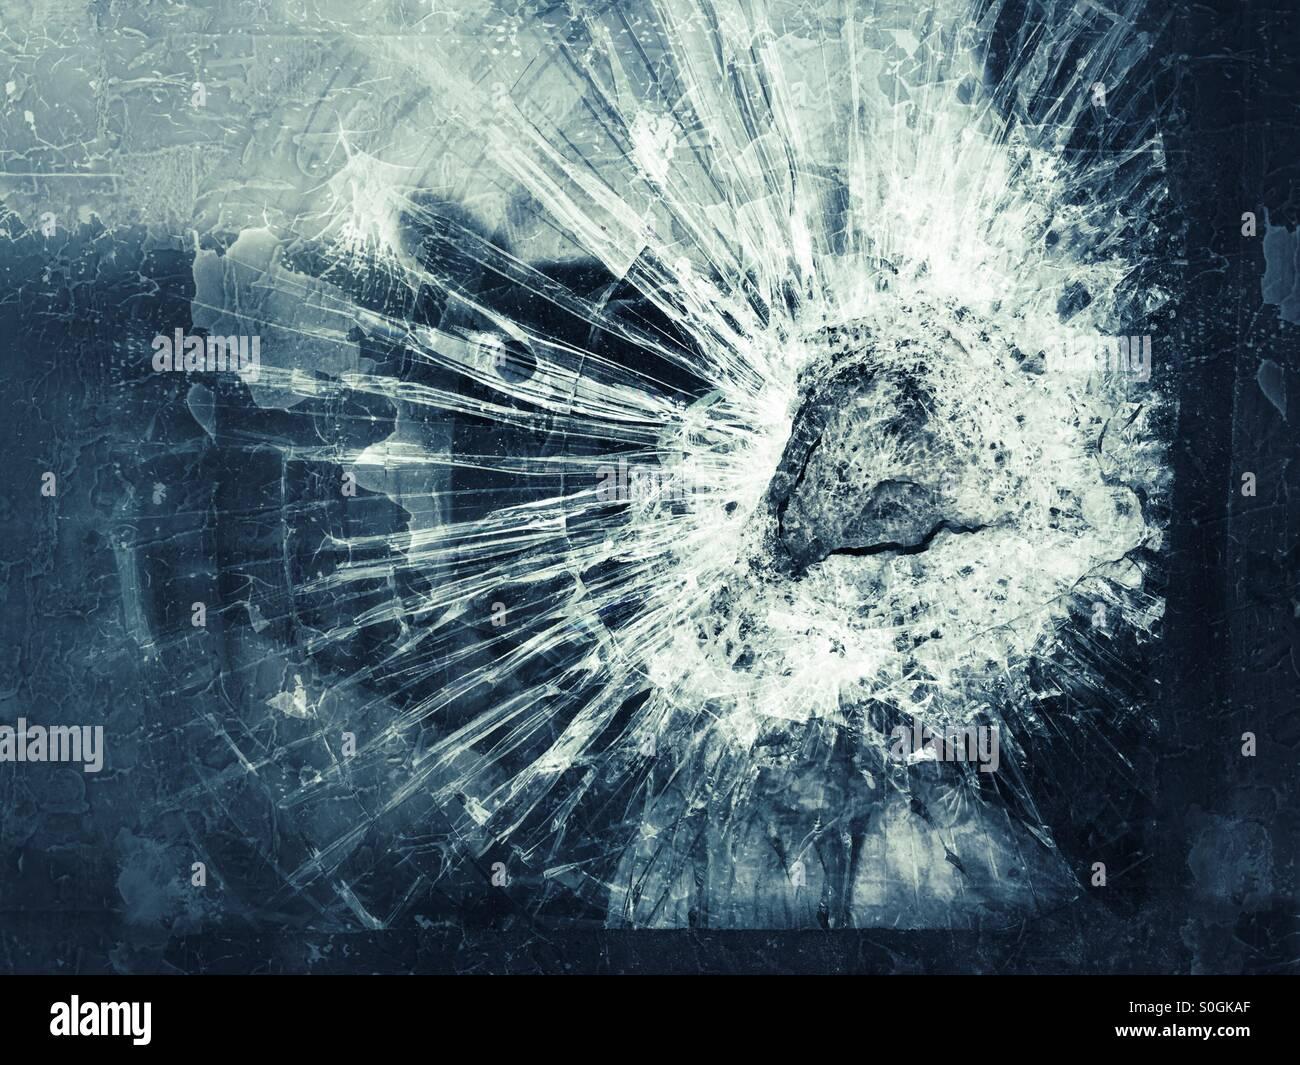 Broken glass - Stock Image